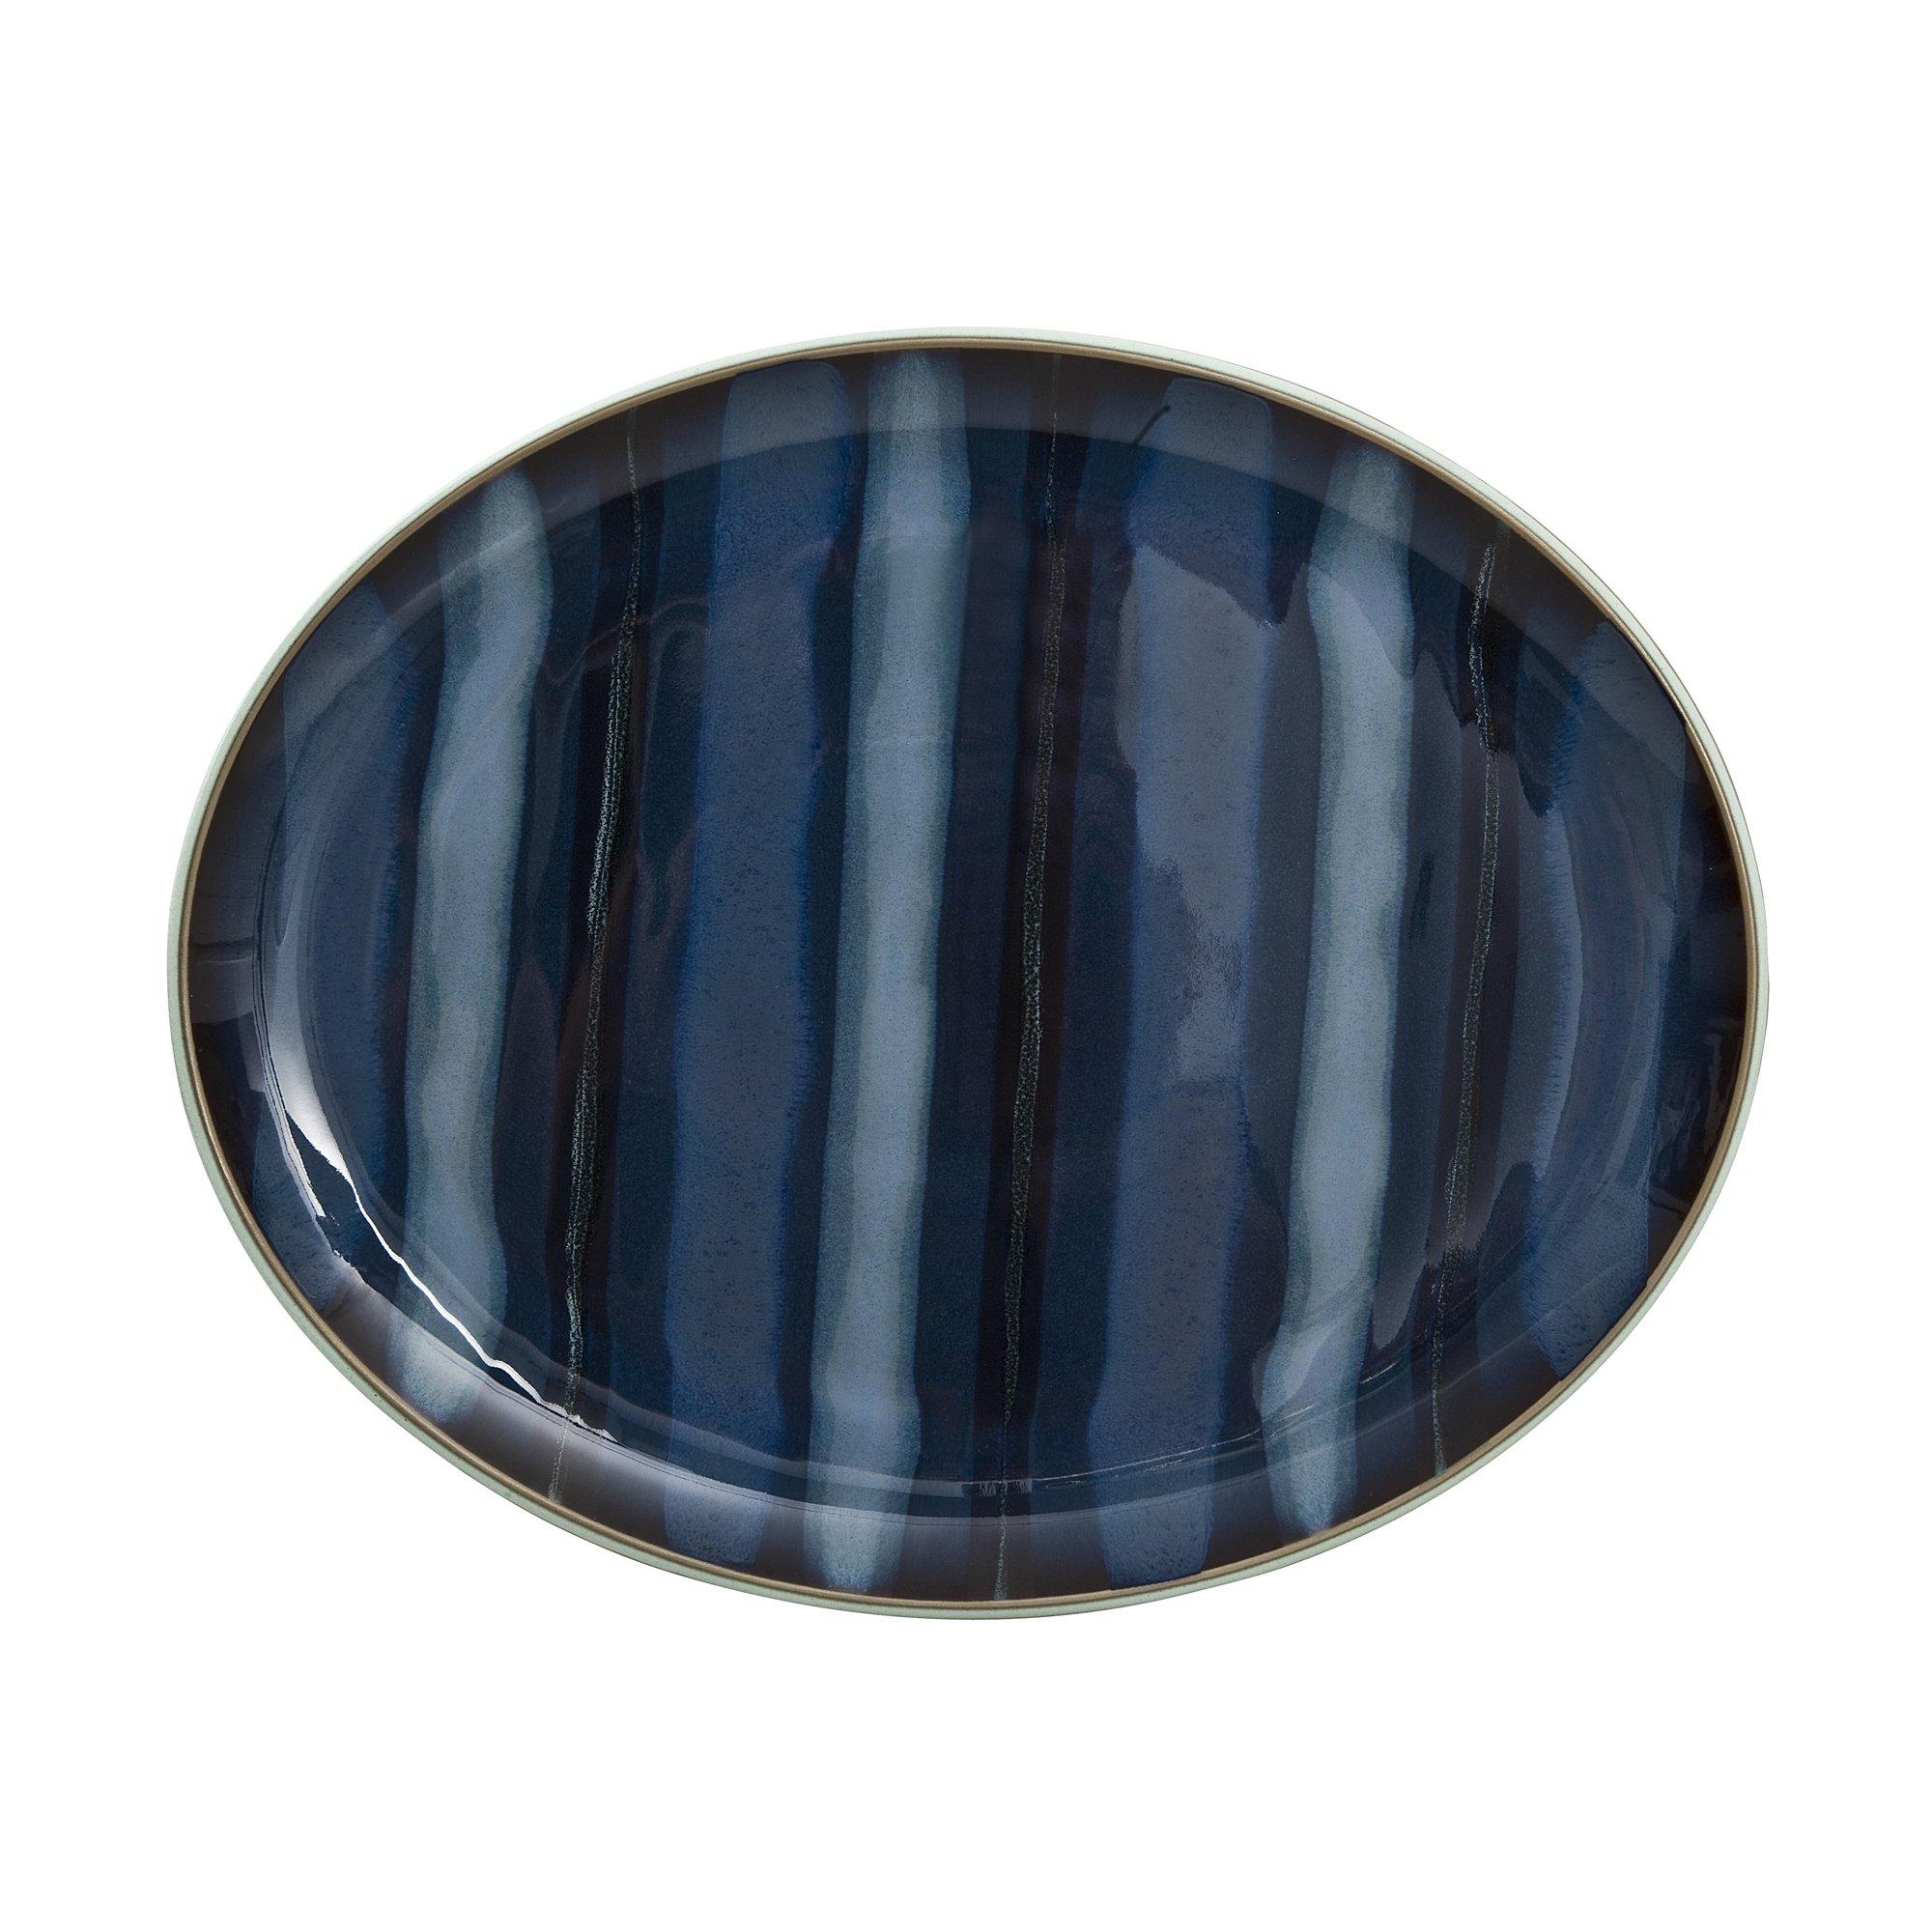 Denby USA Peveril Accent Oval Platter, Blue